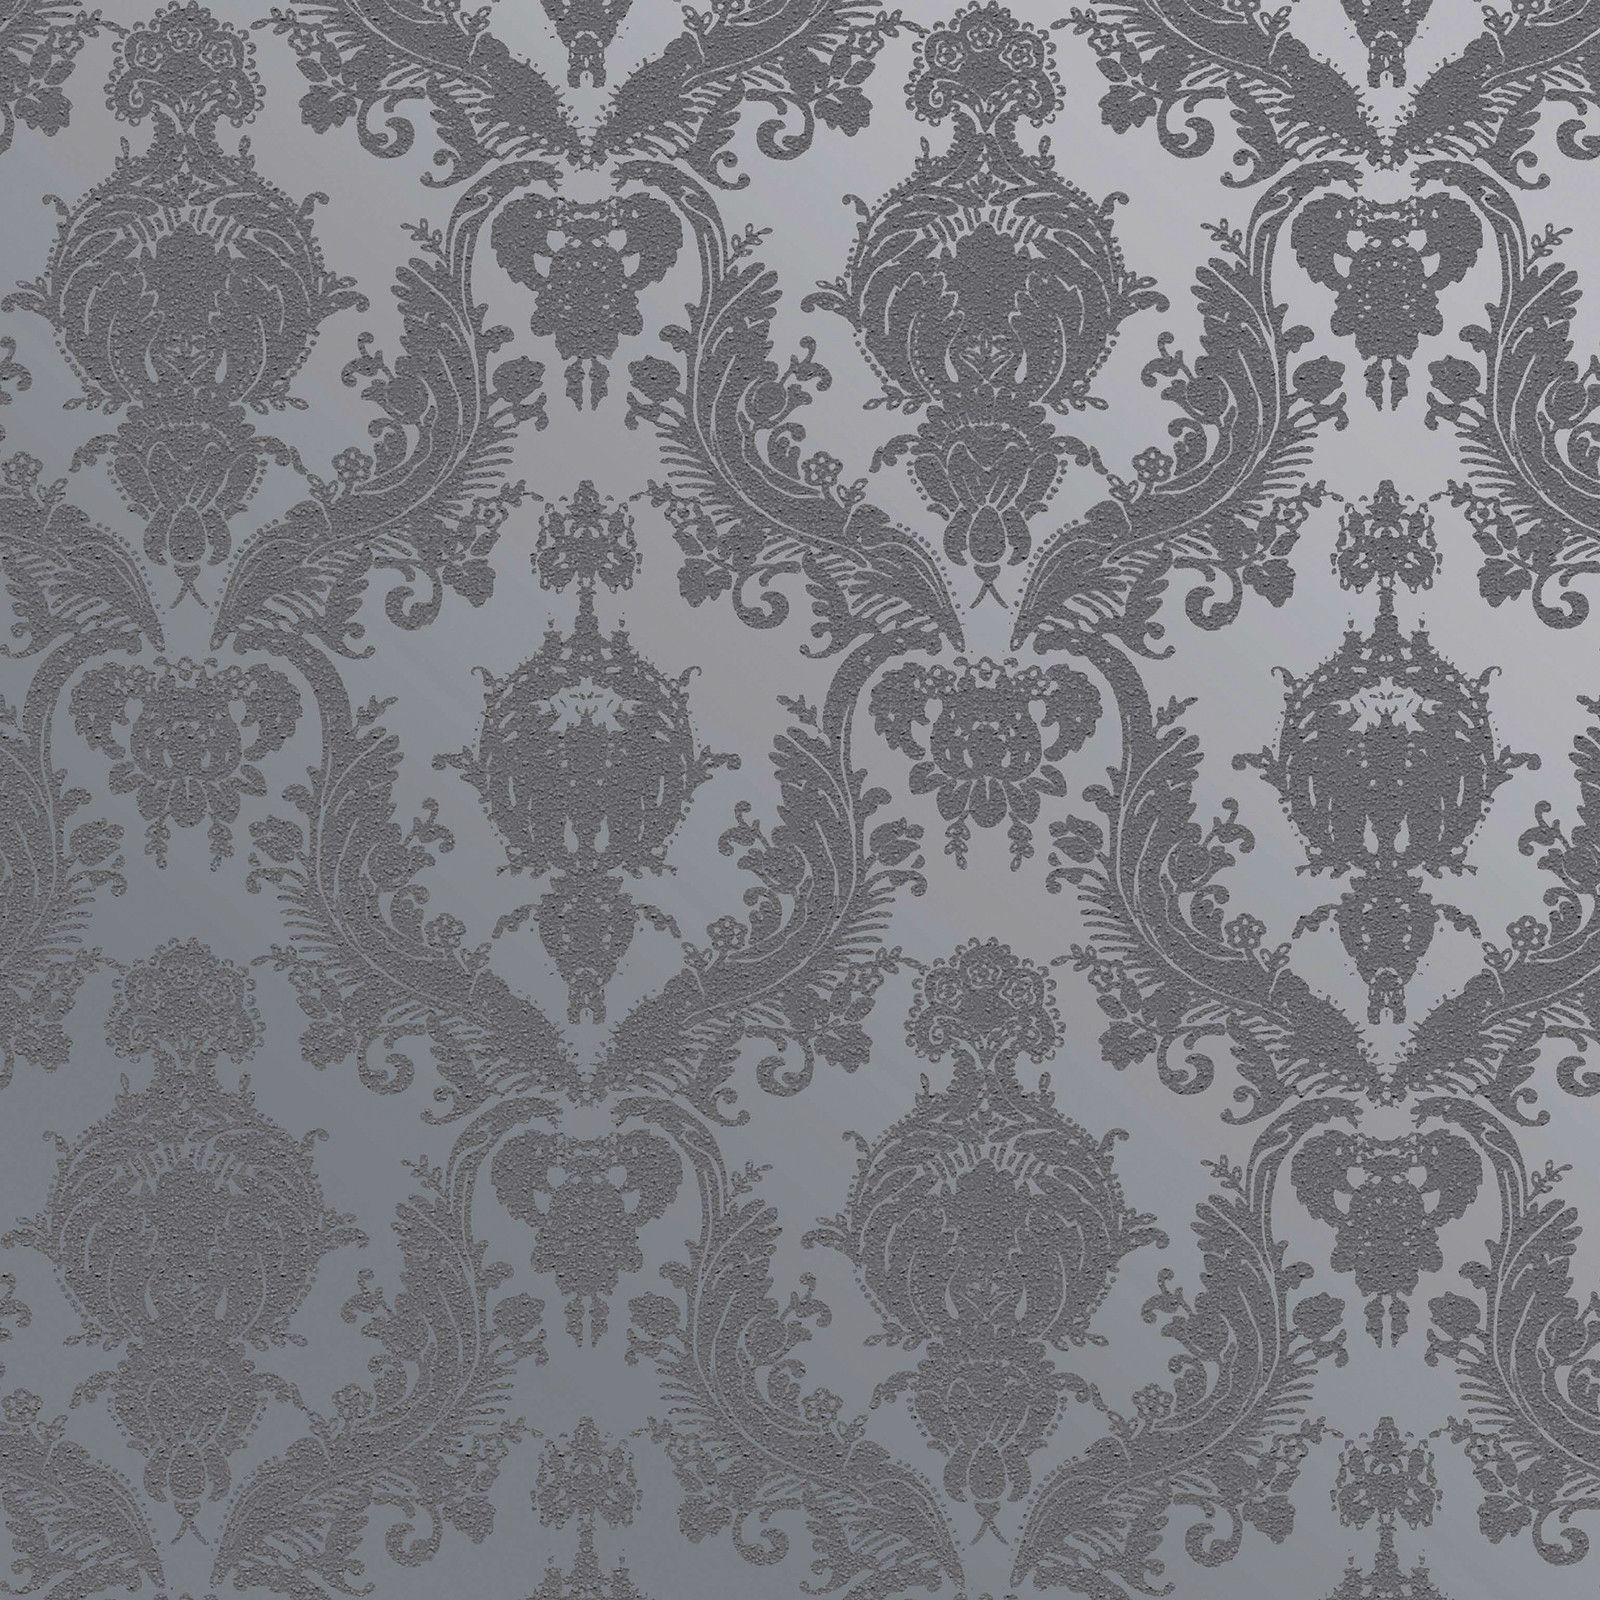 Damsel Textured Removable Wallpaper Victorian Wallpaper Gothic Wallpaper Damask Wallpaper